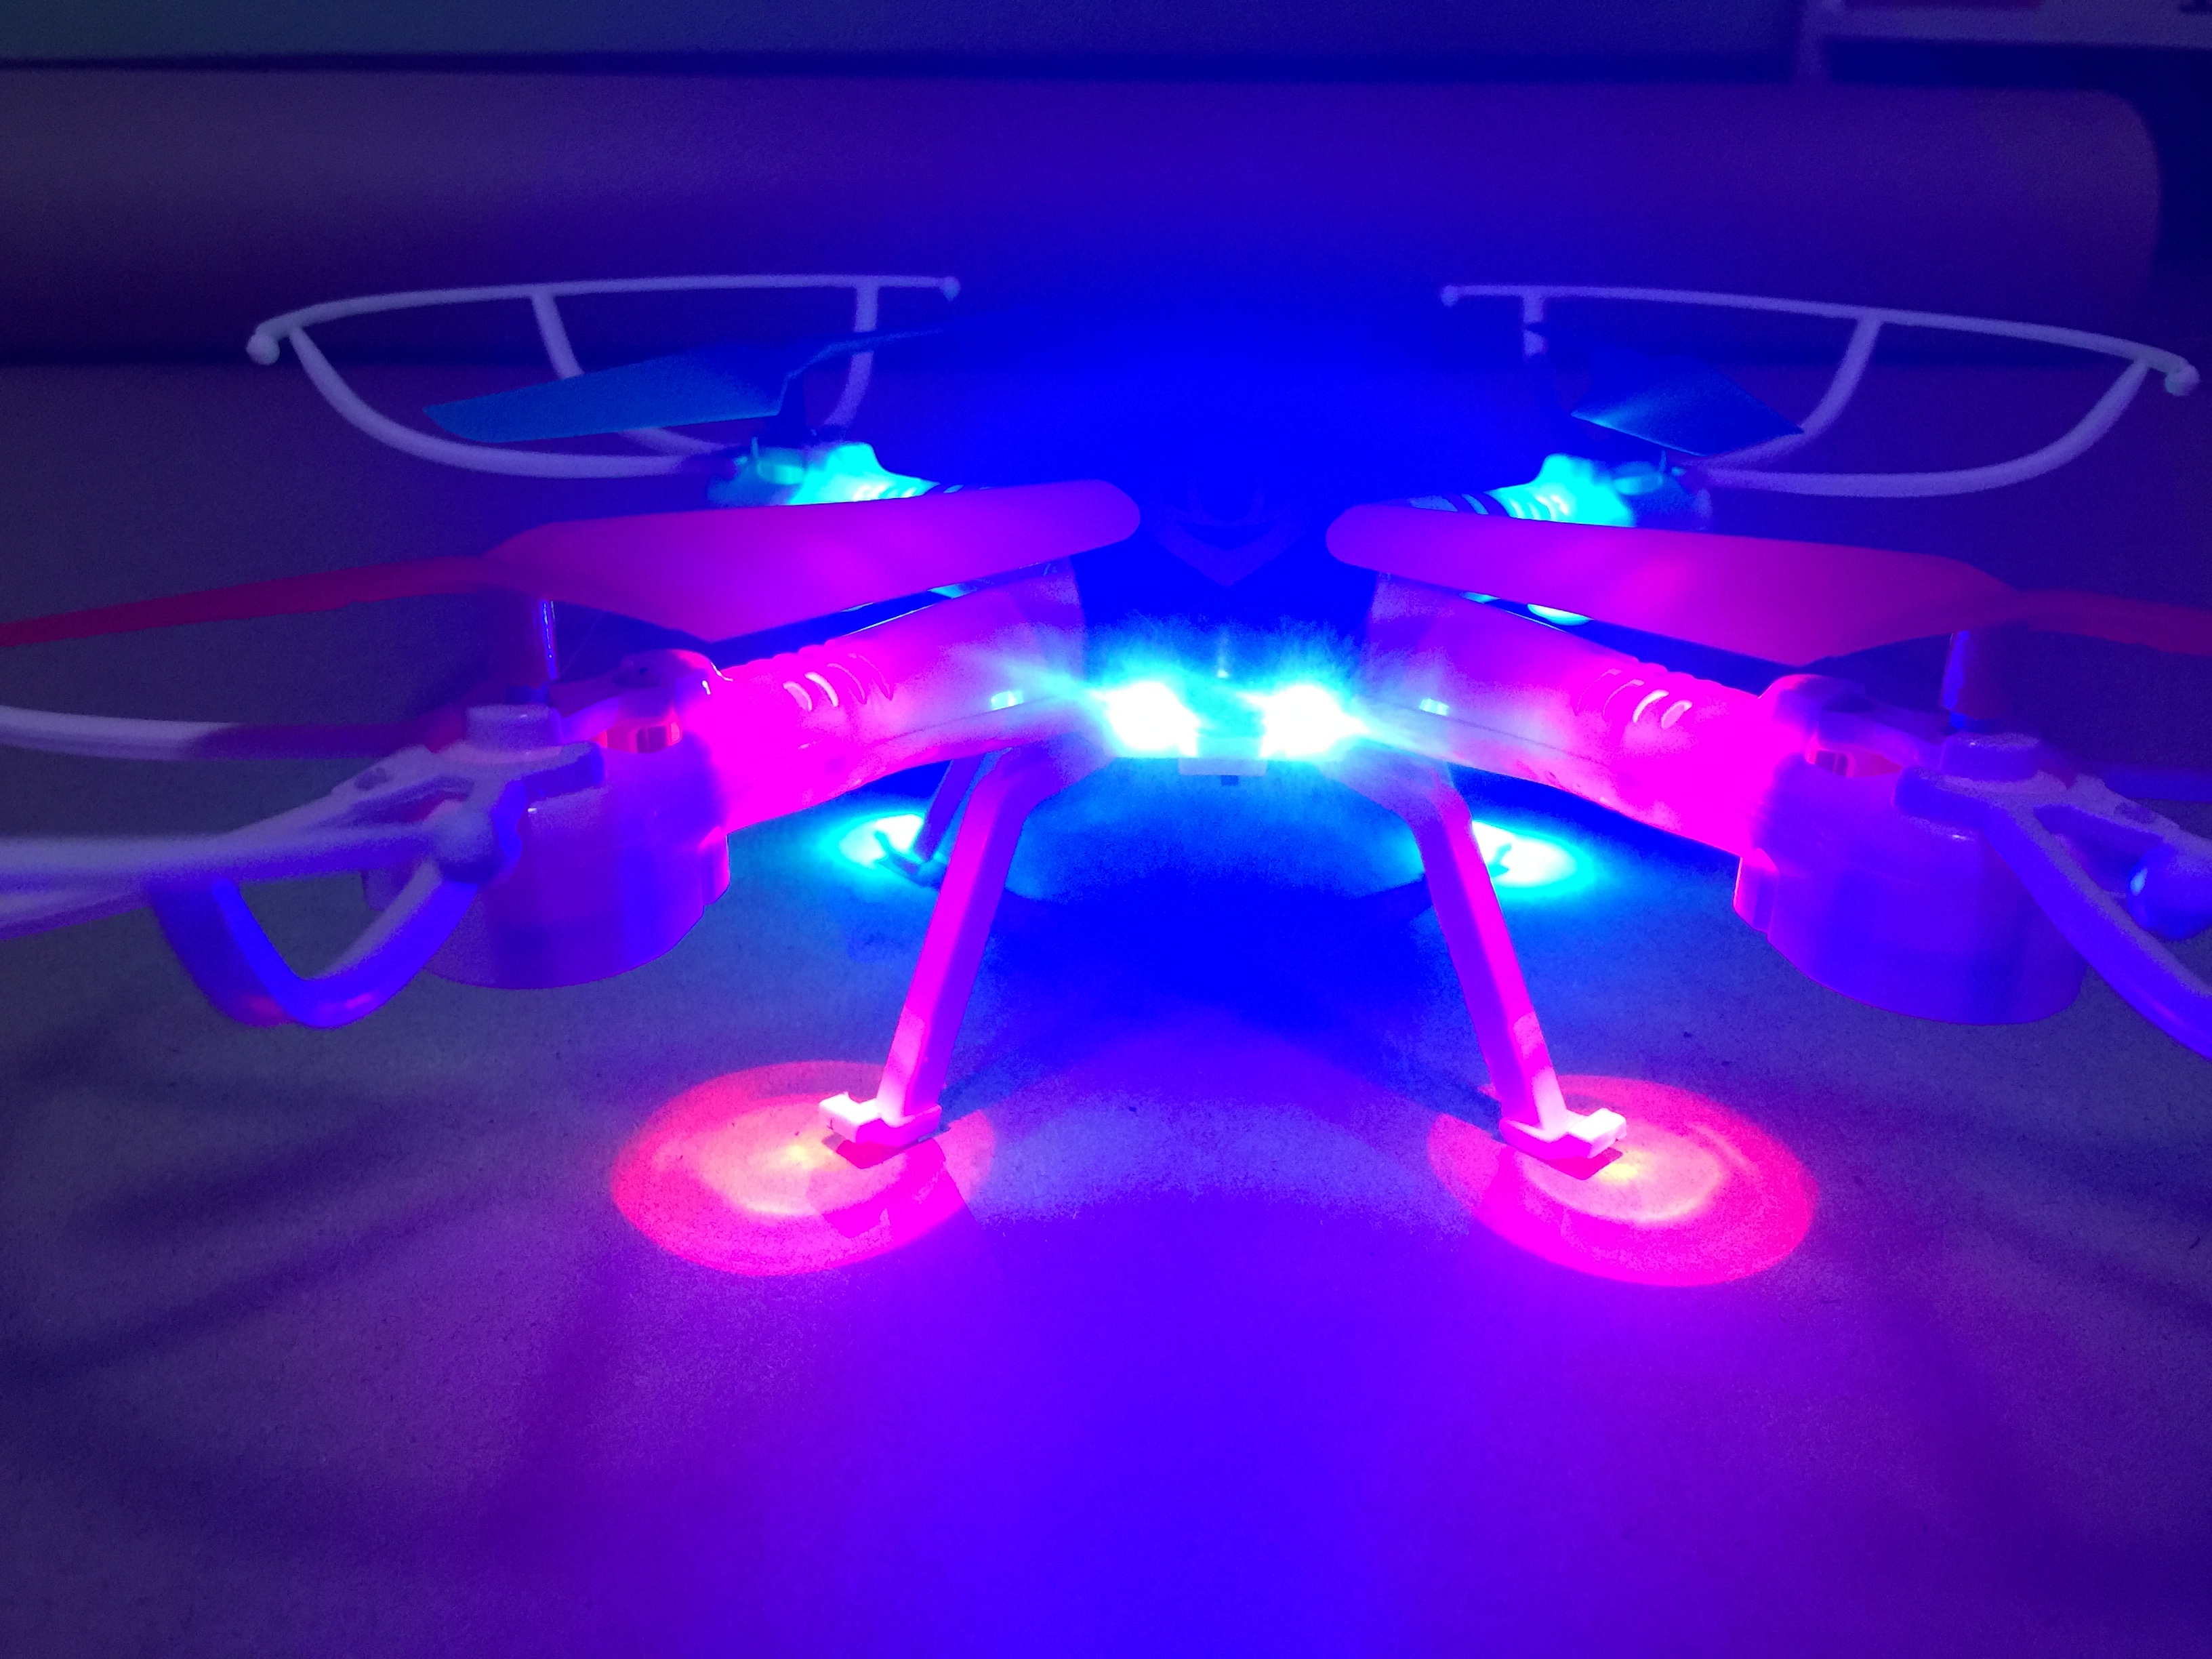 Sky Falcon HC611 โดรนแสงสี (ไม่มีกล้อง)